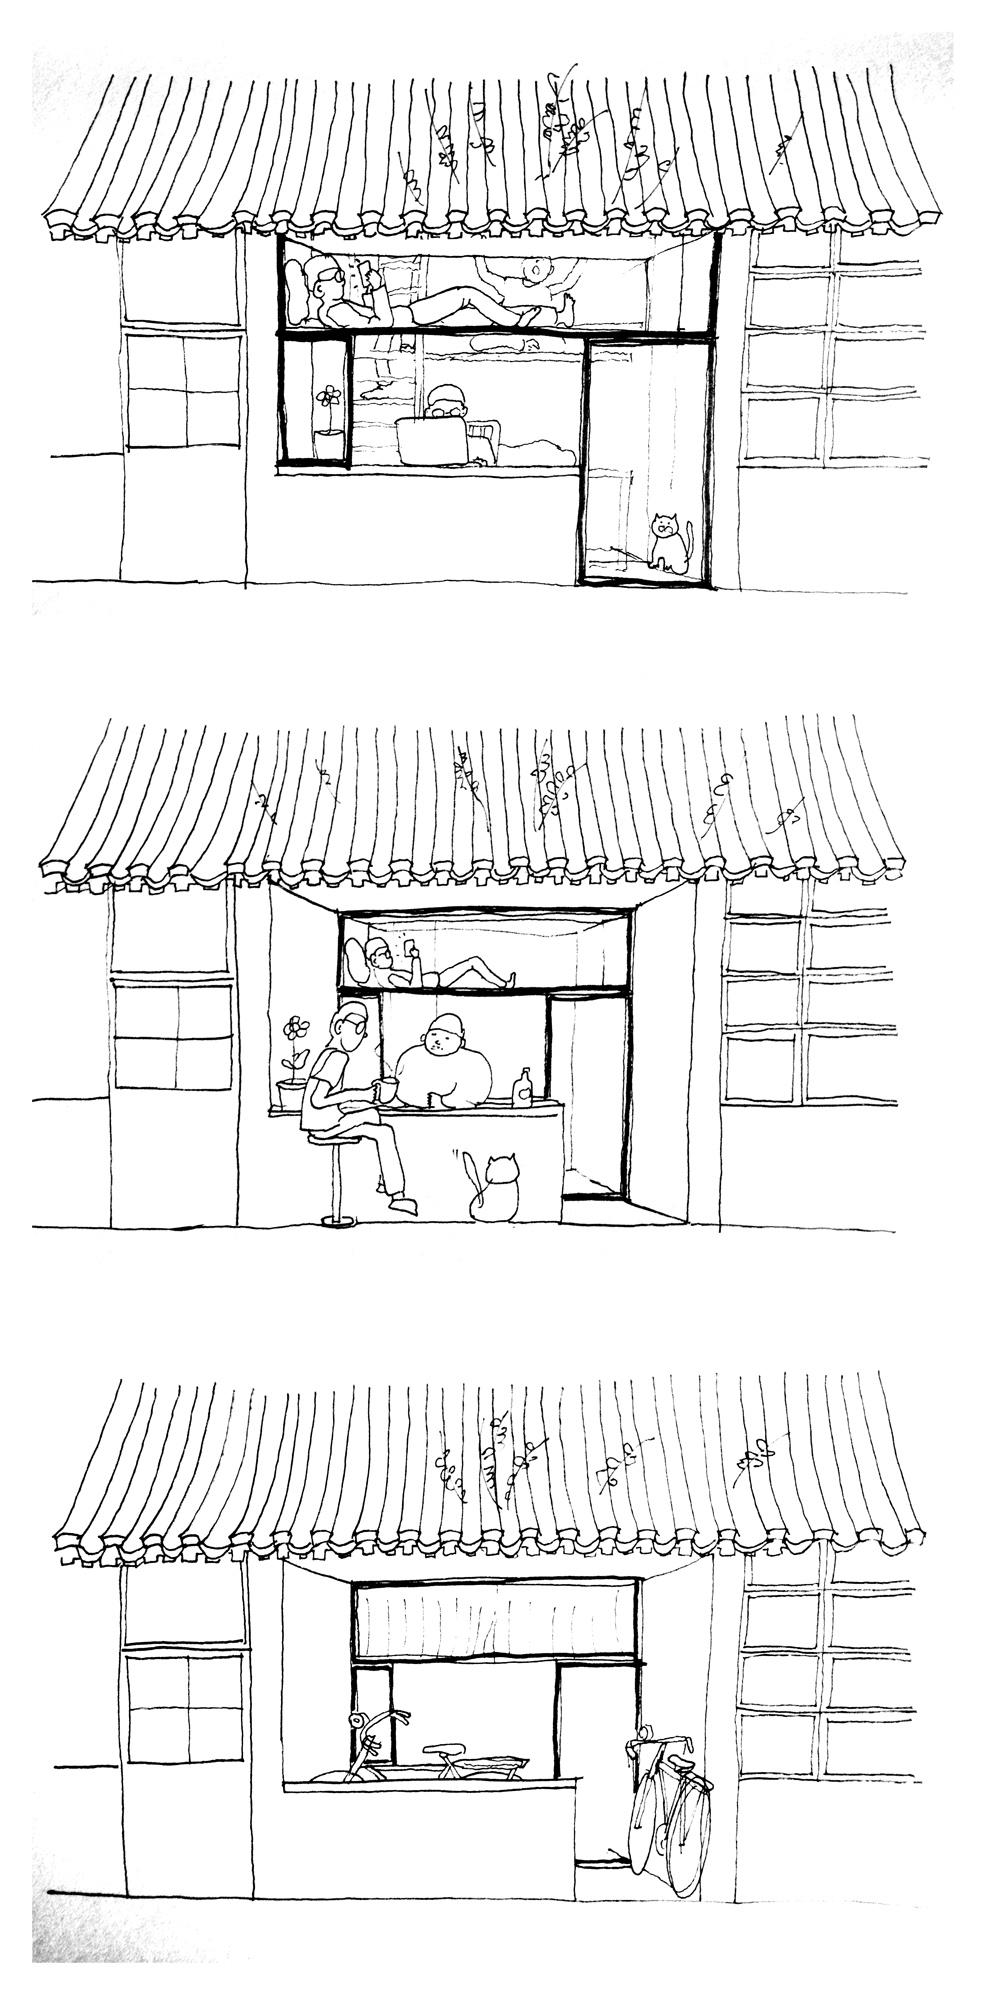 Caopu-humble-hostel-hisheji (20)